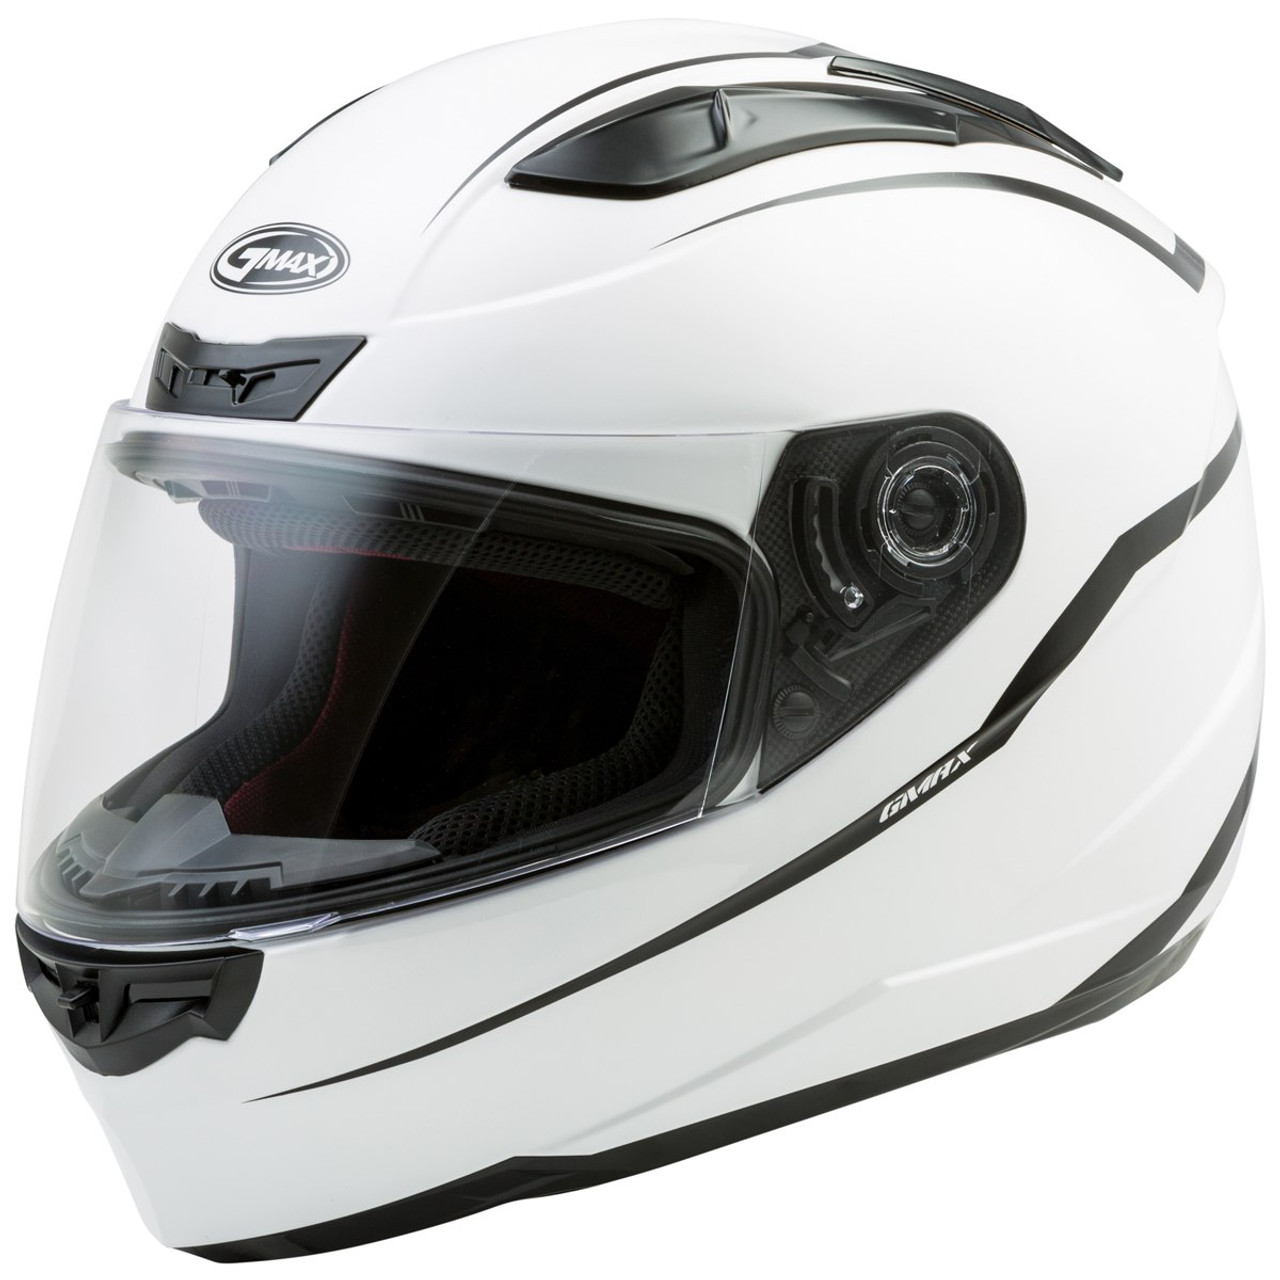 1a49d5a5 ... GMax FF88 Precept Helmet - White Black ...